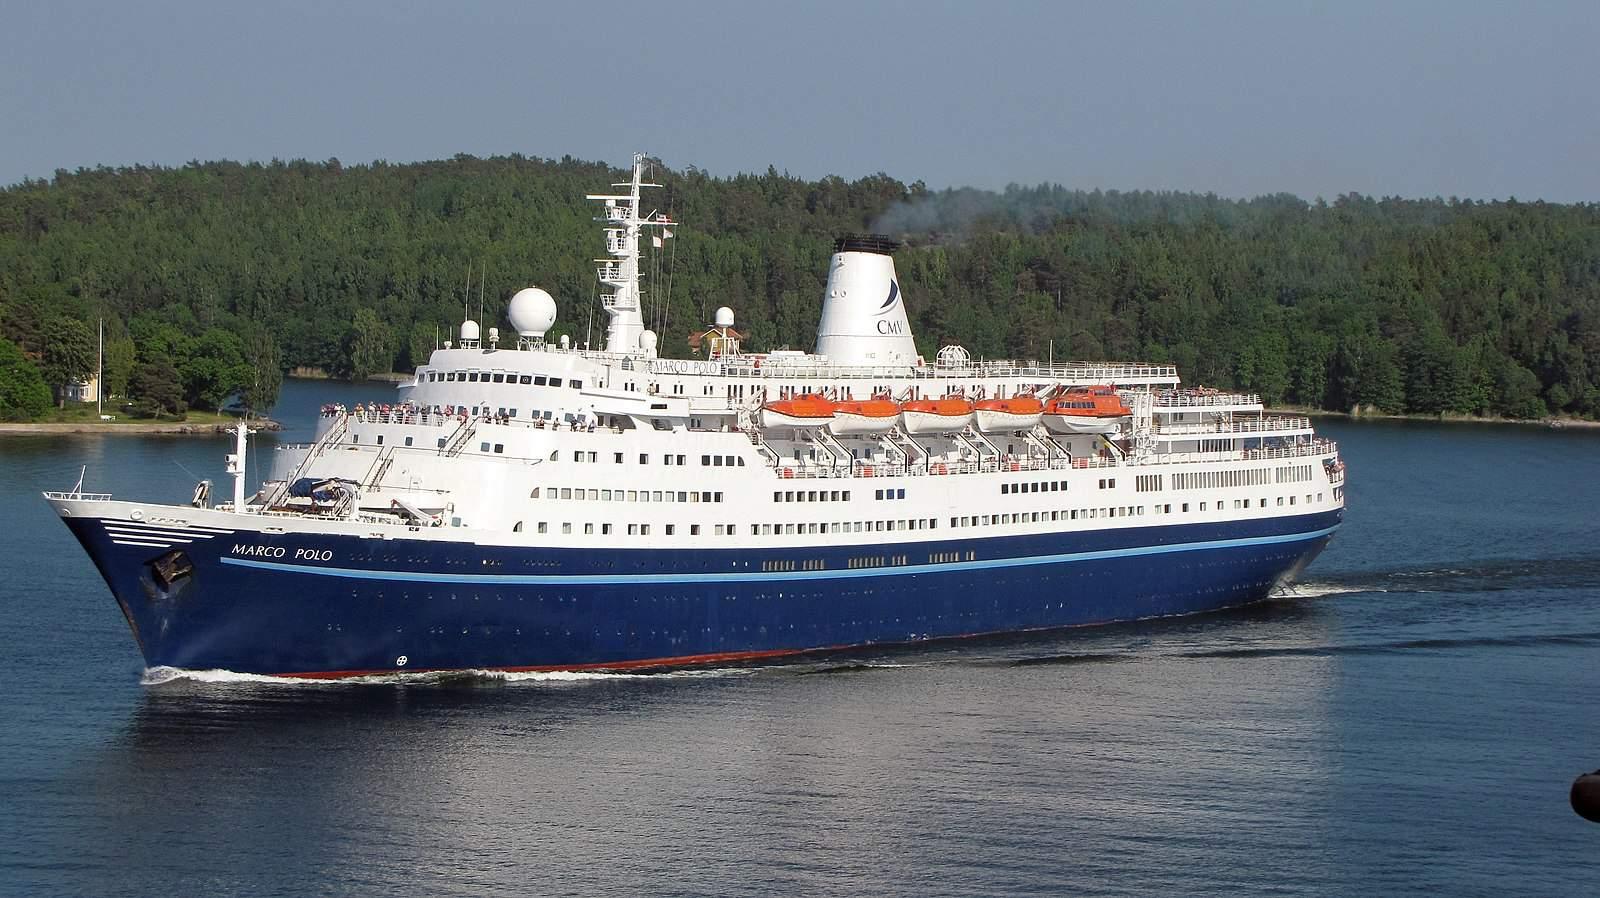 marco polo ship wikimedia commons